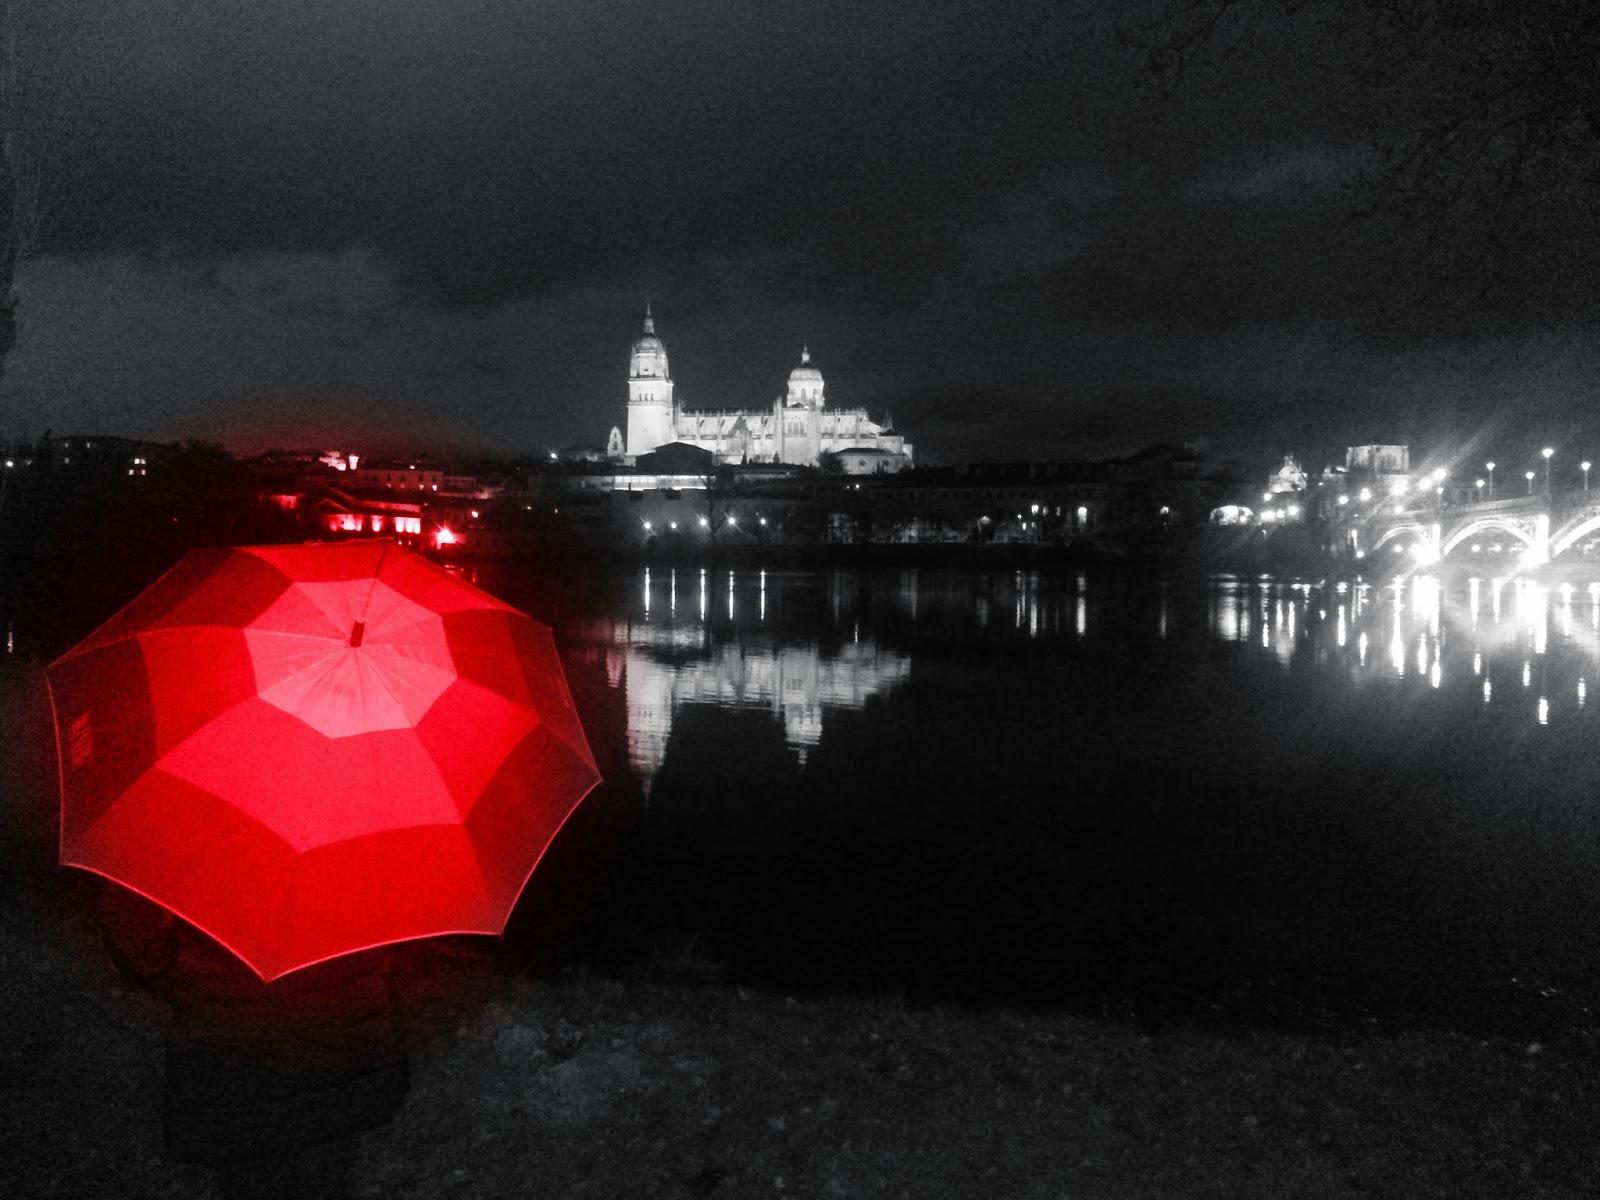 BloggerTraveller, Febrero, Rojo, Salamanca, Catedral